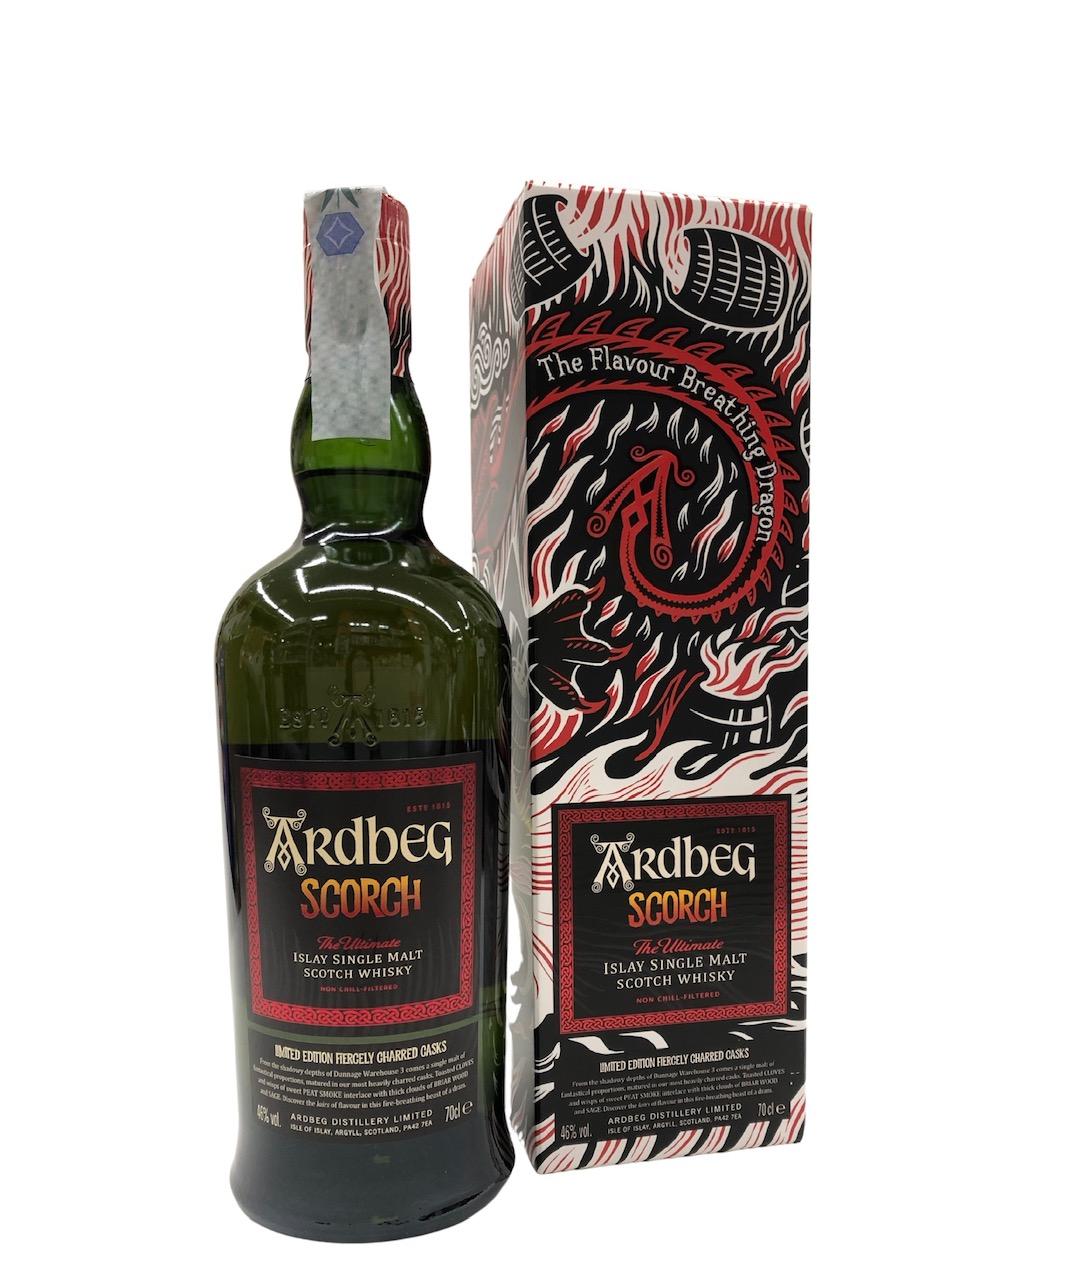 Whisky Ardbeg Scorch edizione limitata 2021 - Isle of Islay -Scozia